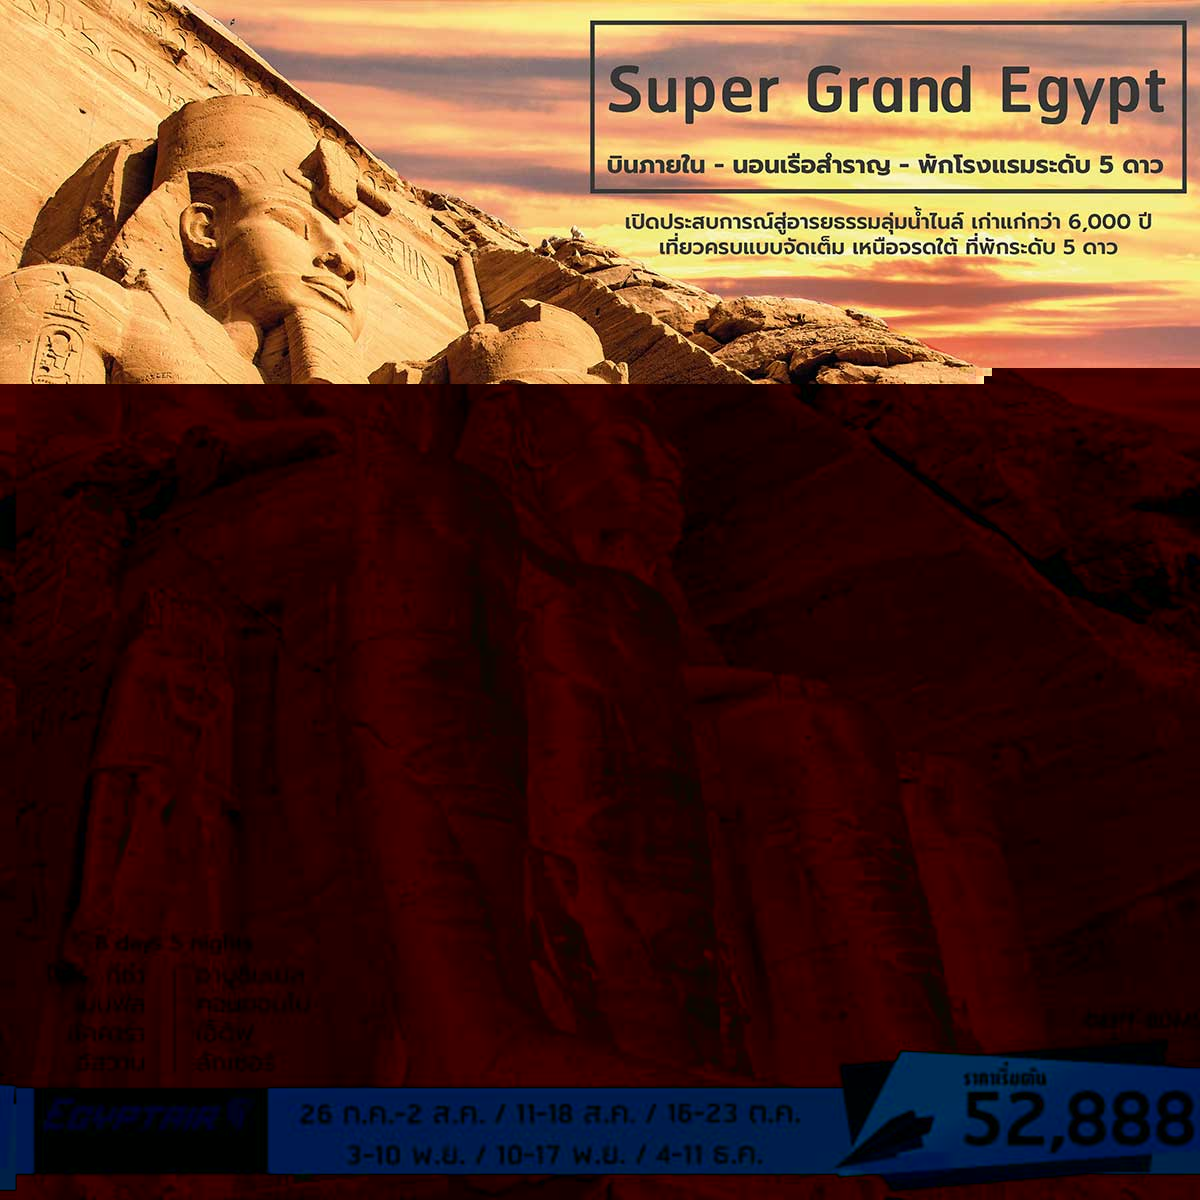 SUPER GRAND EGYPT  8D 5N